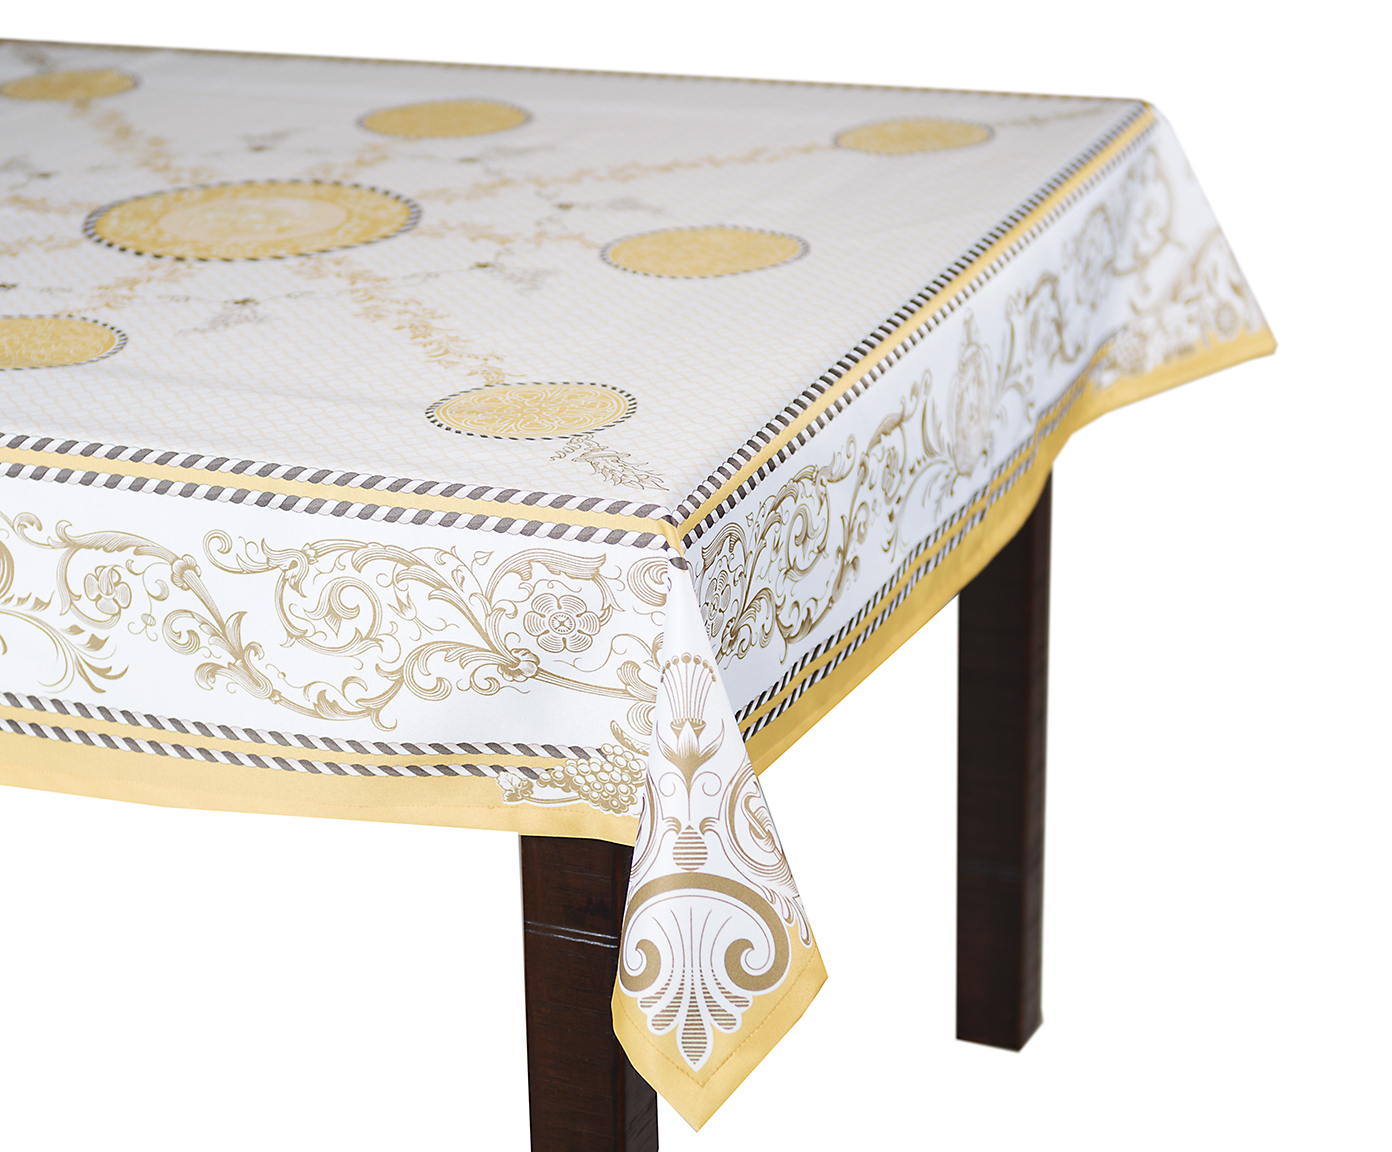 Кухня Скатерть 140x220 Blonder Home Laroux желтая skatert-140x220-blonder-home-laroux-zheltaya-ssha-rossiya.jpg